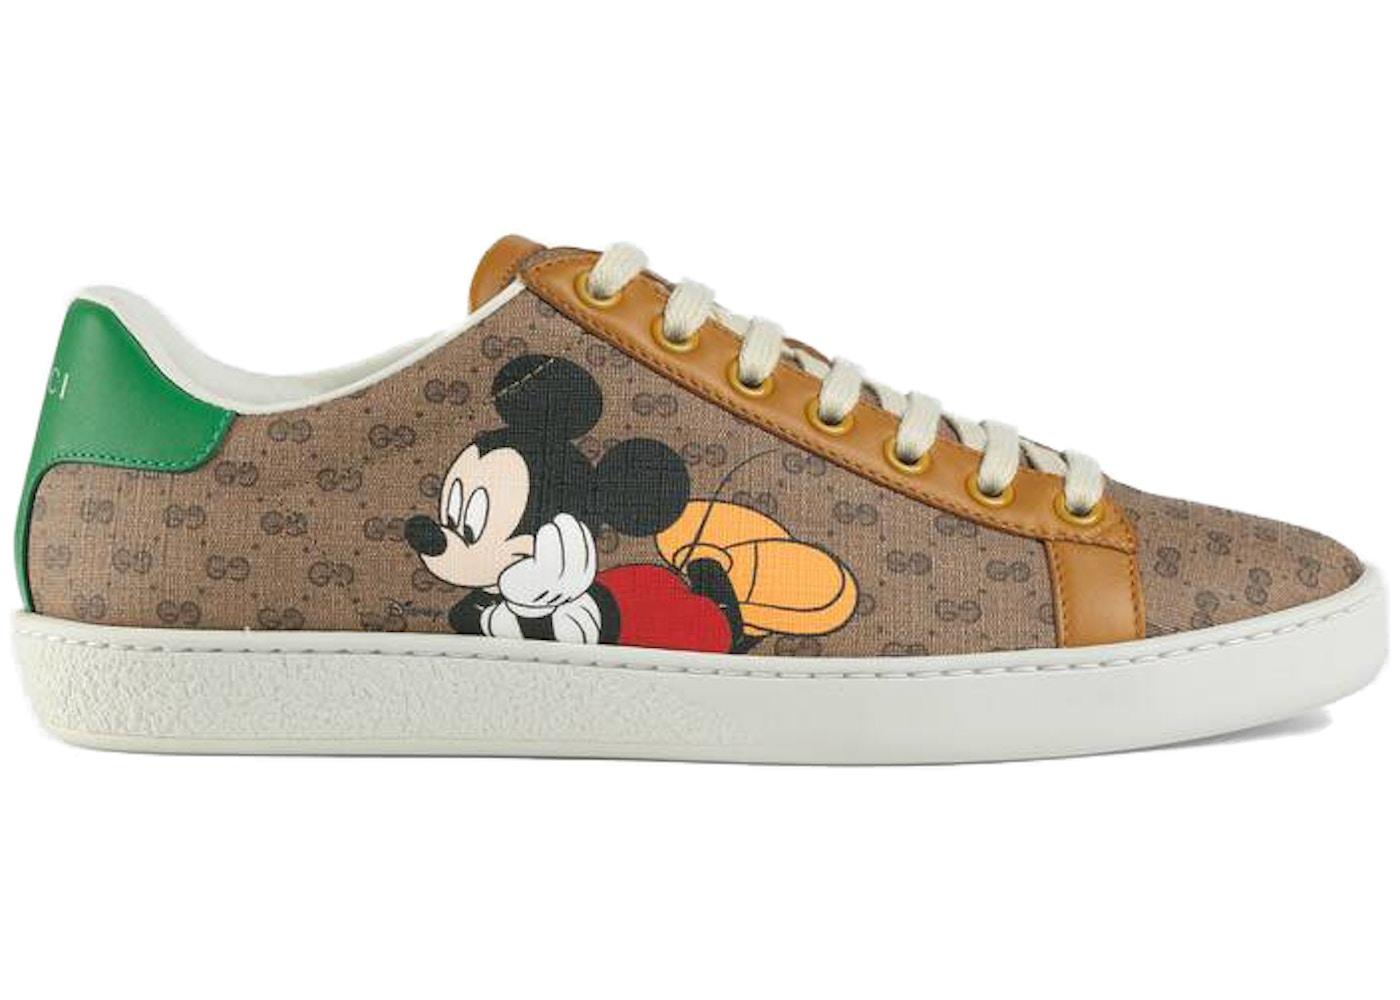 Gucci Ace x Disney (W)